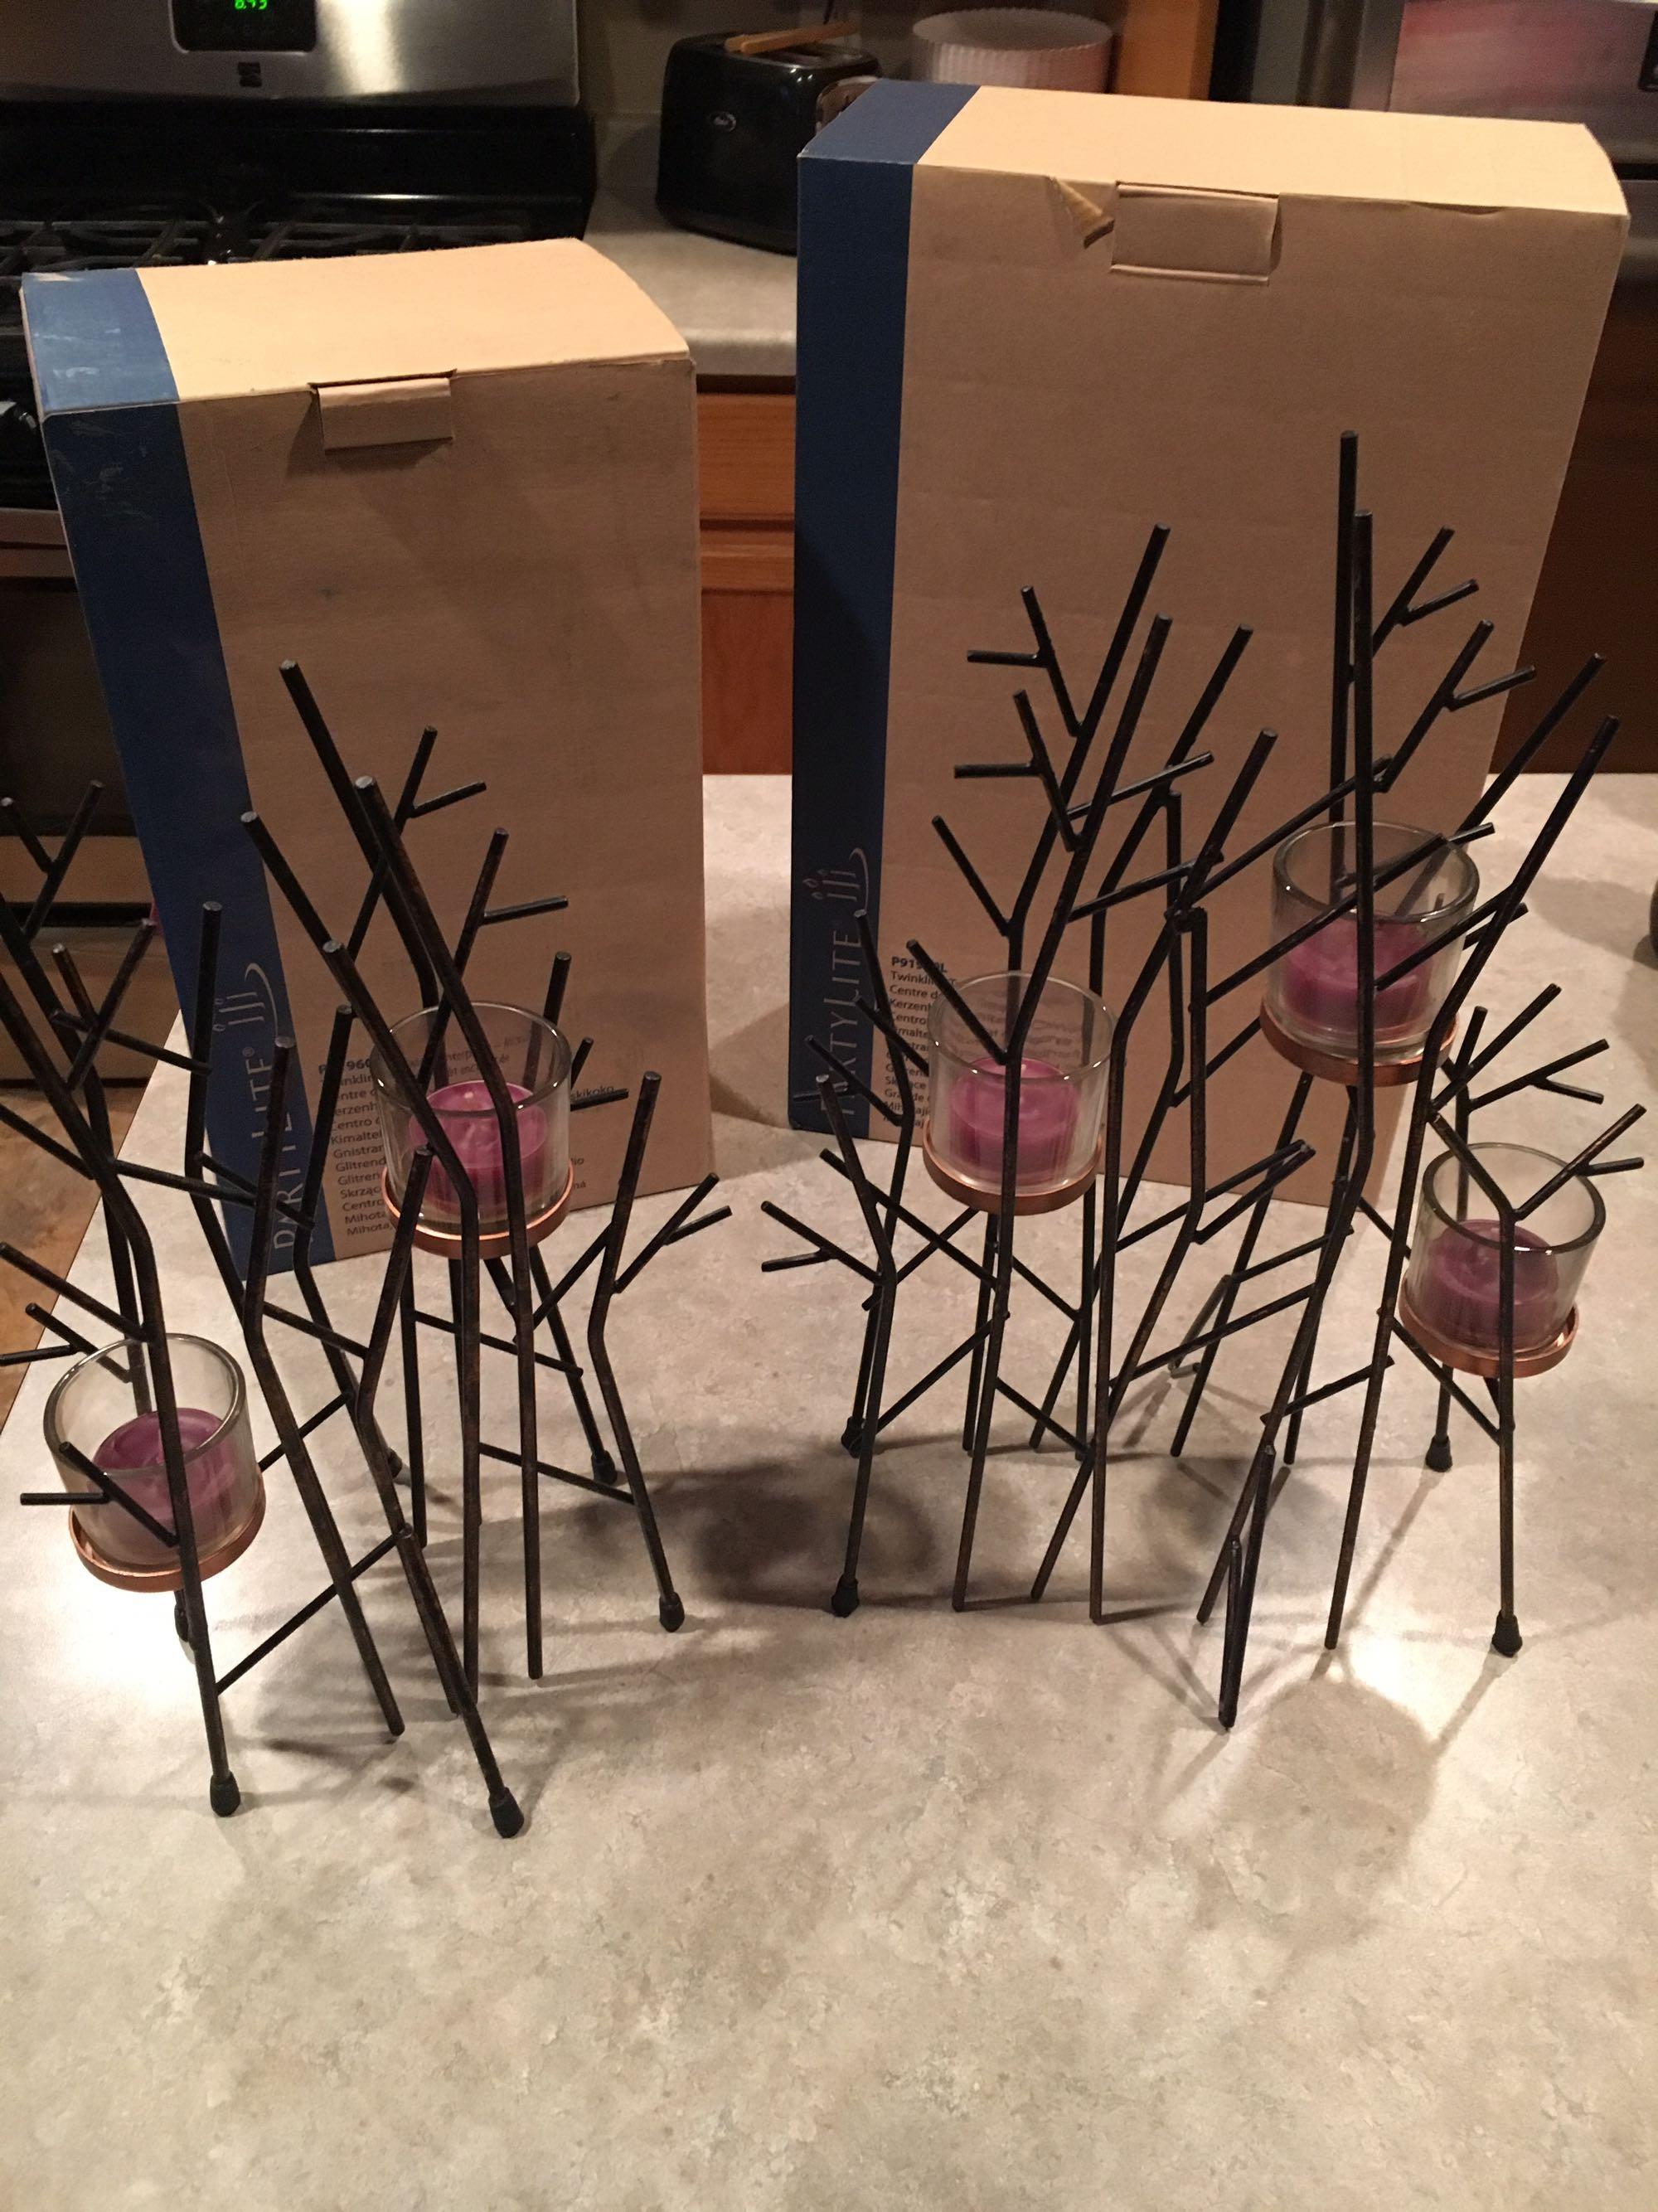 Partylite Twinkling Twigs Centerpiece Set nib